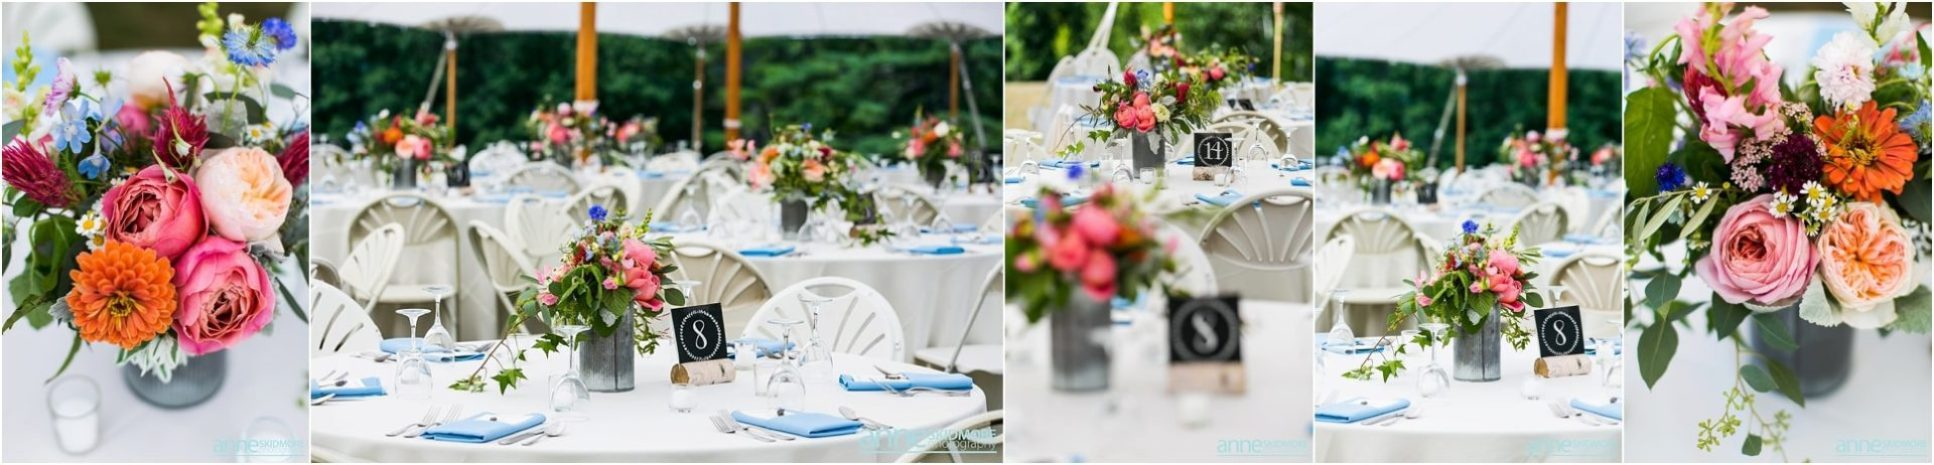 new_hampshire_wedding_photography_0056